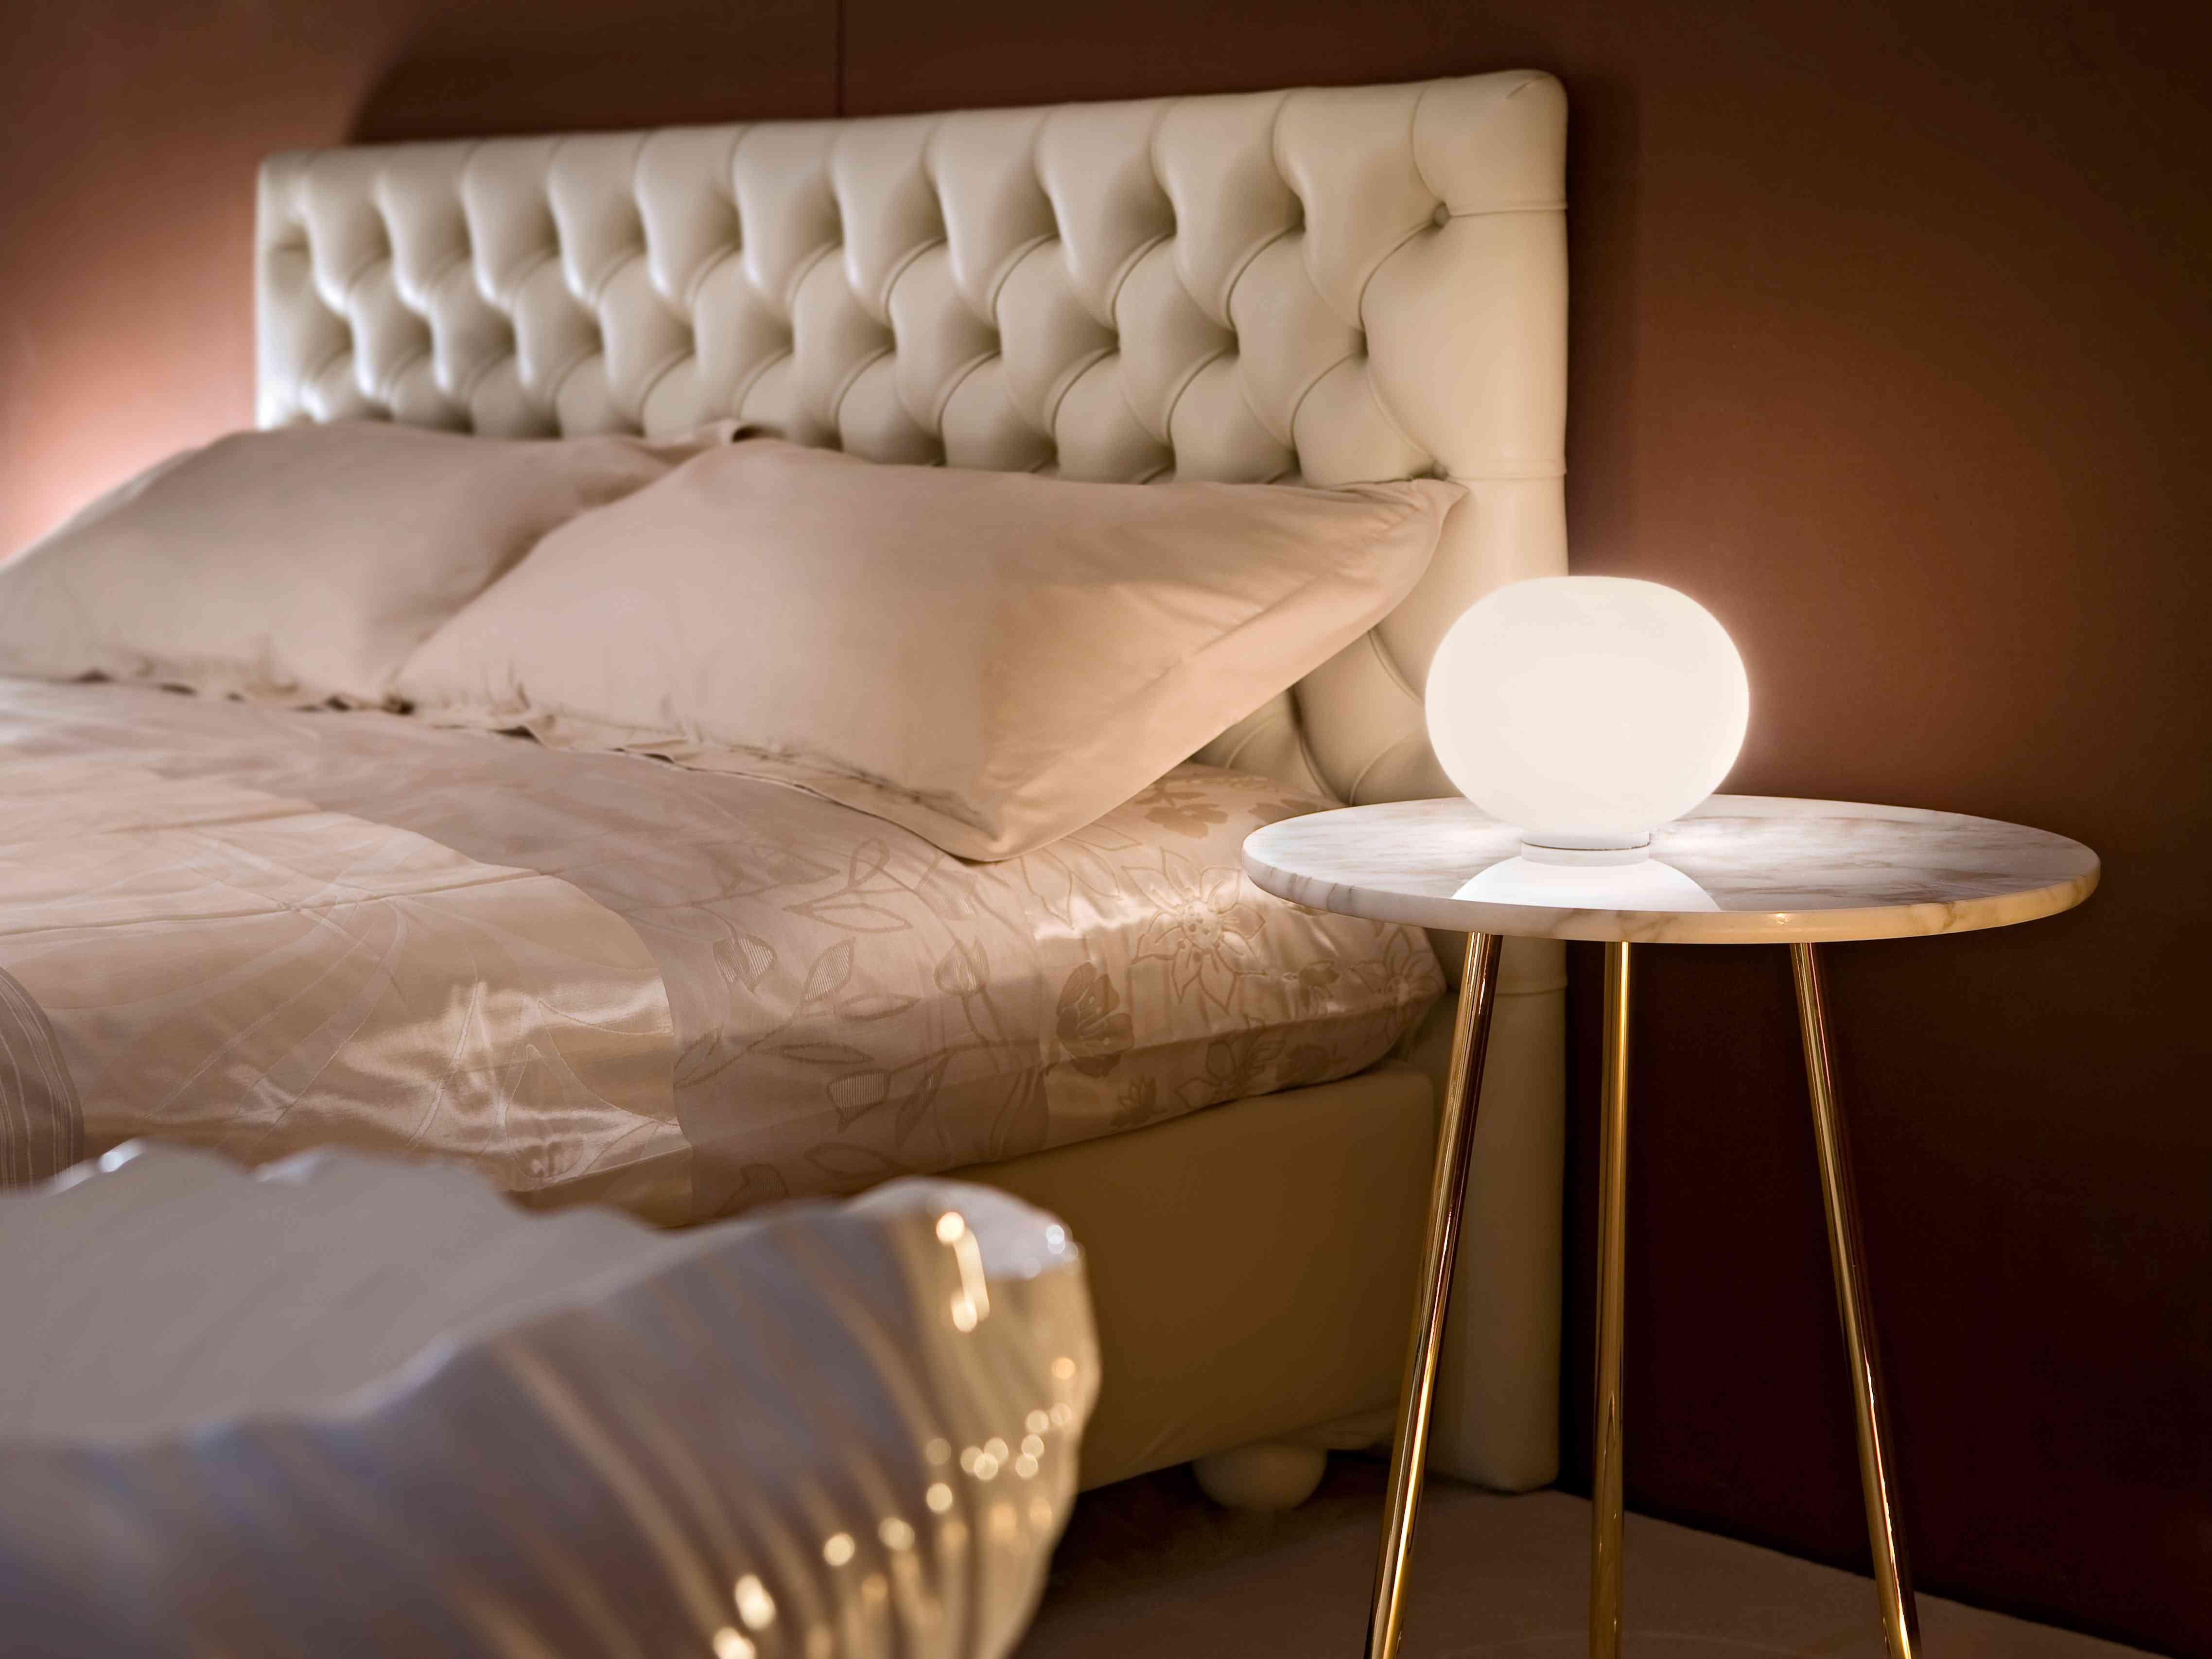 Glo-Ball Basic Modern Bedside Table Lamp